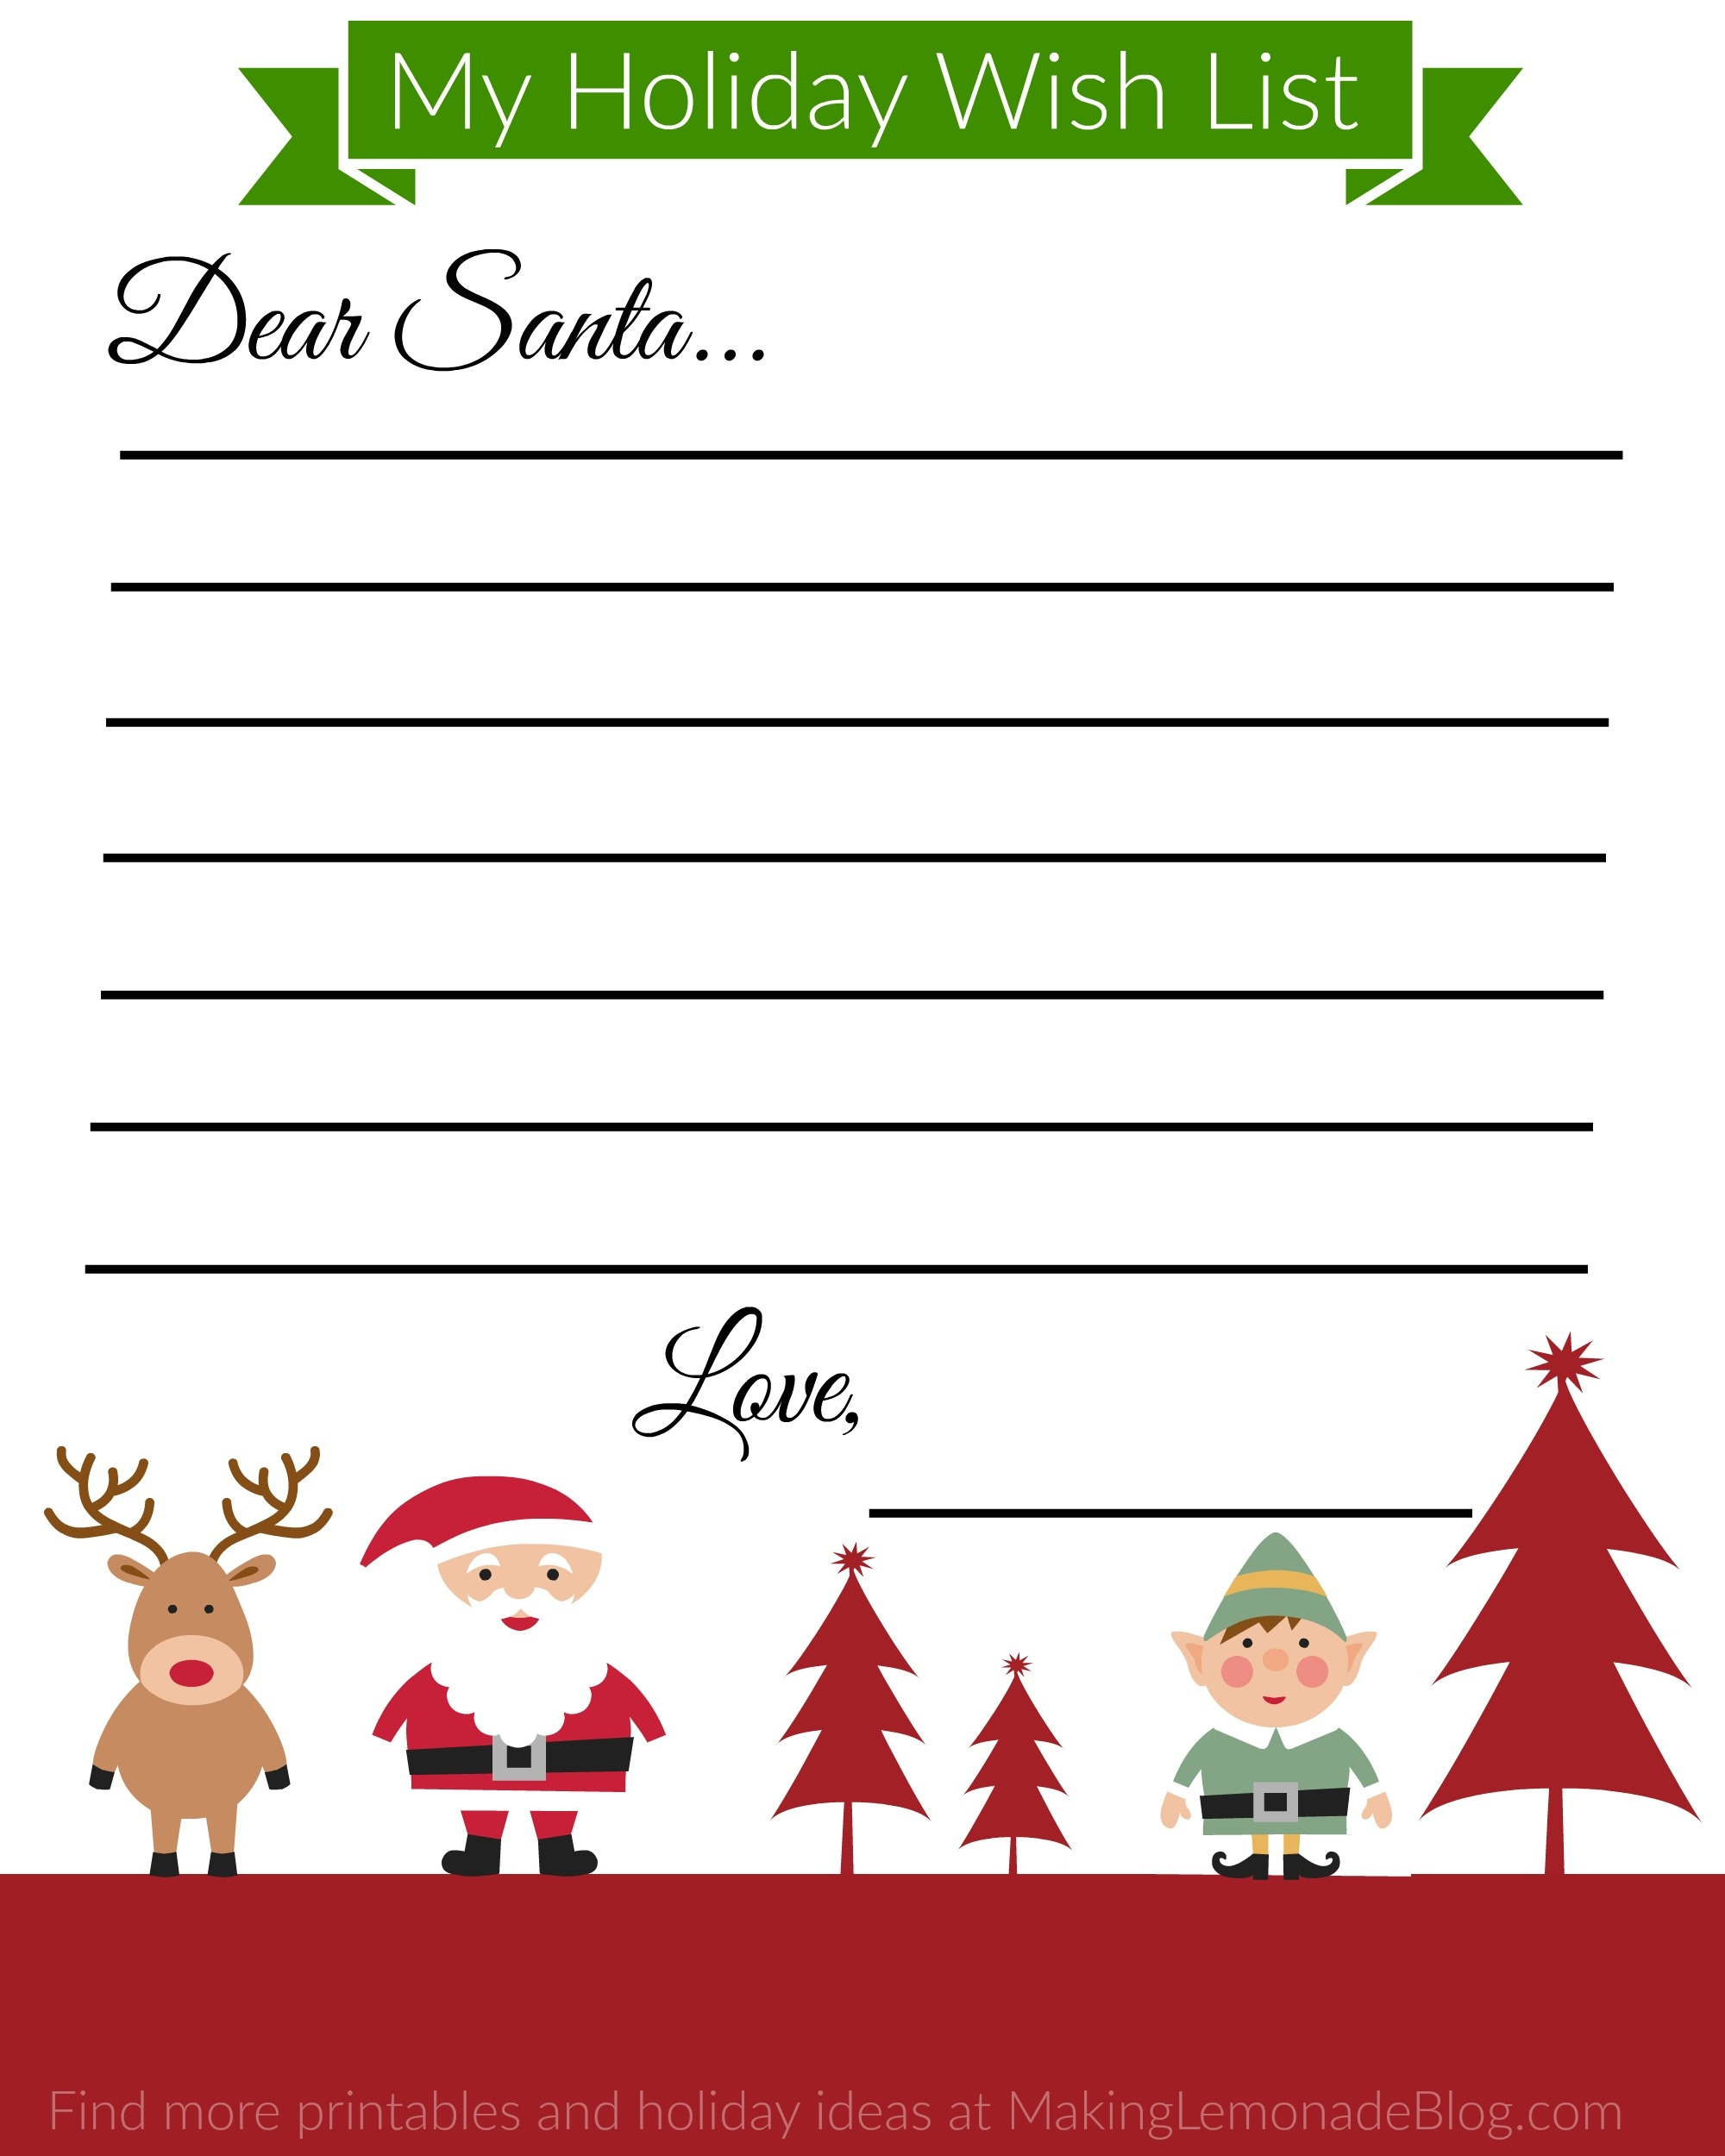 Free Printable Holiday Wish List For Kids | Making Lemonade - Free Printable Christmas Wish List